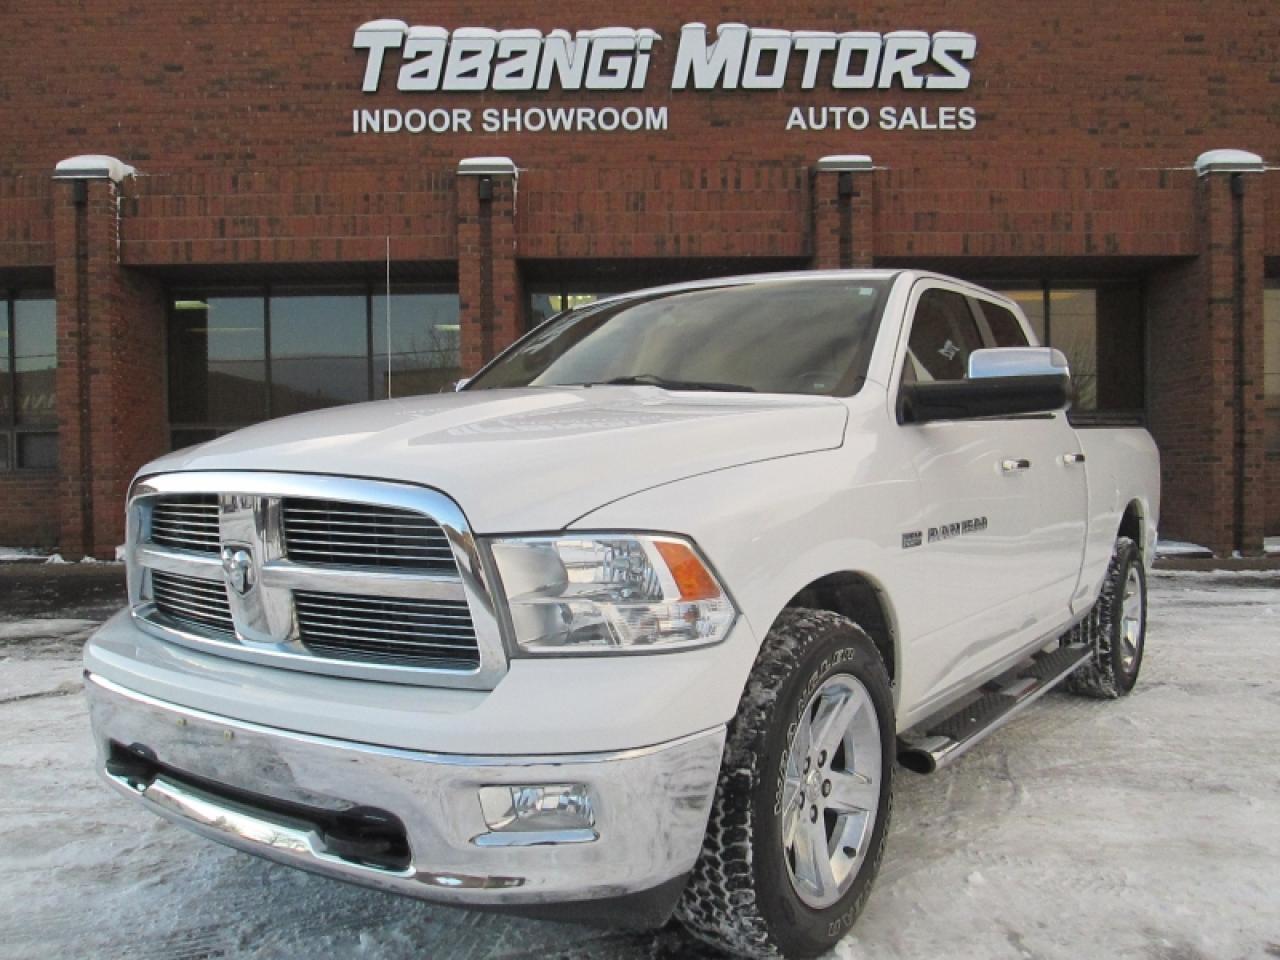 Photo of White 2011 Dodge Ram 1500